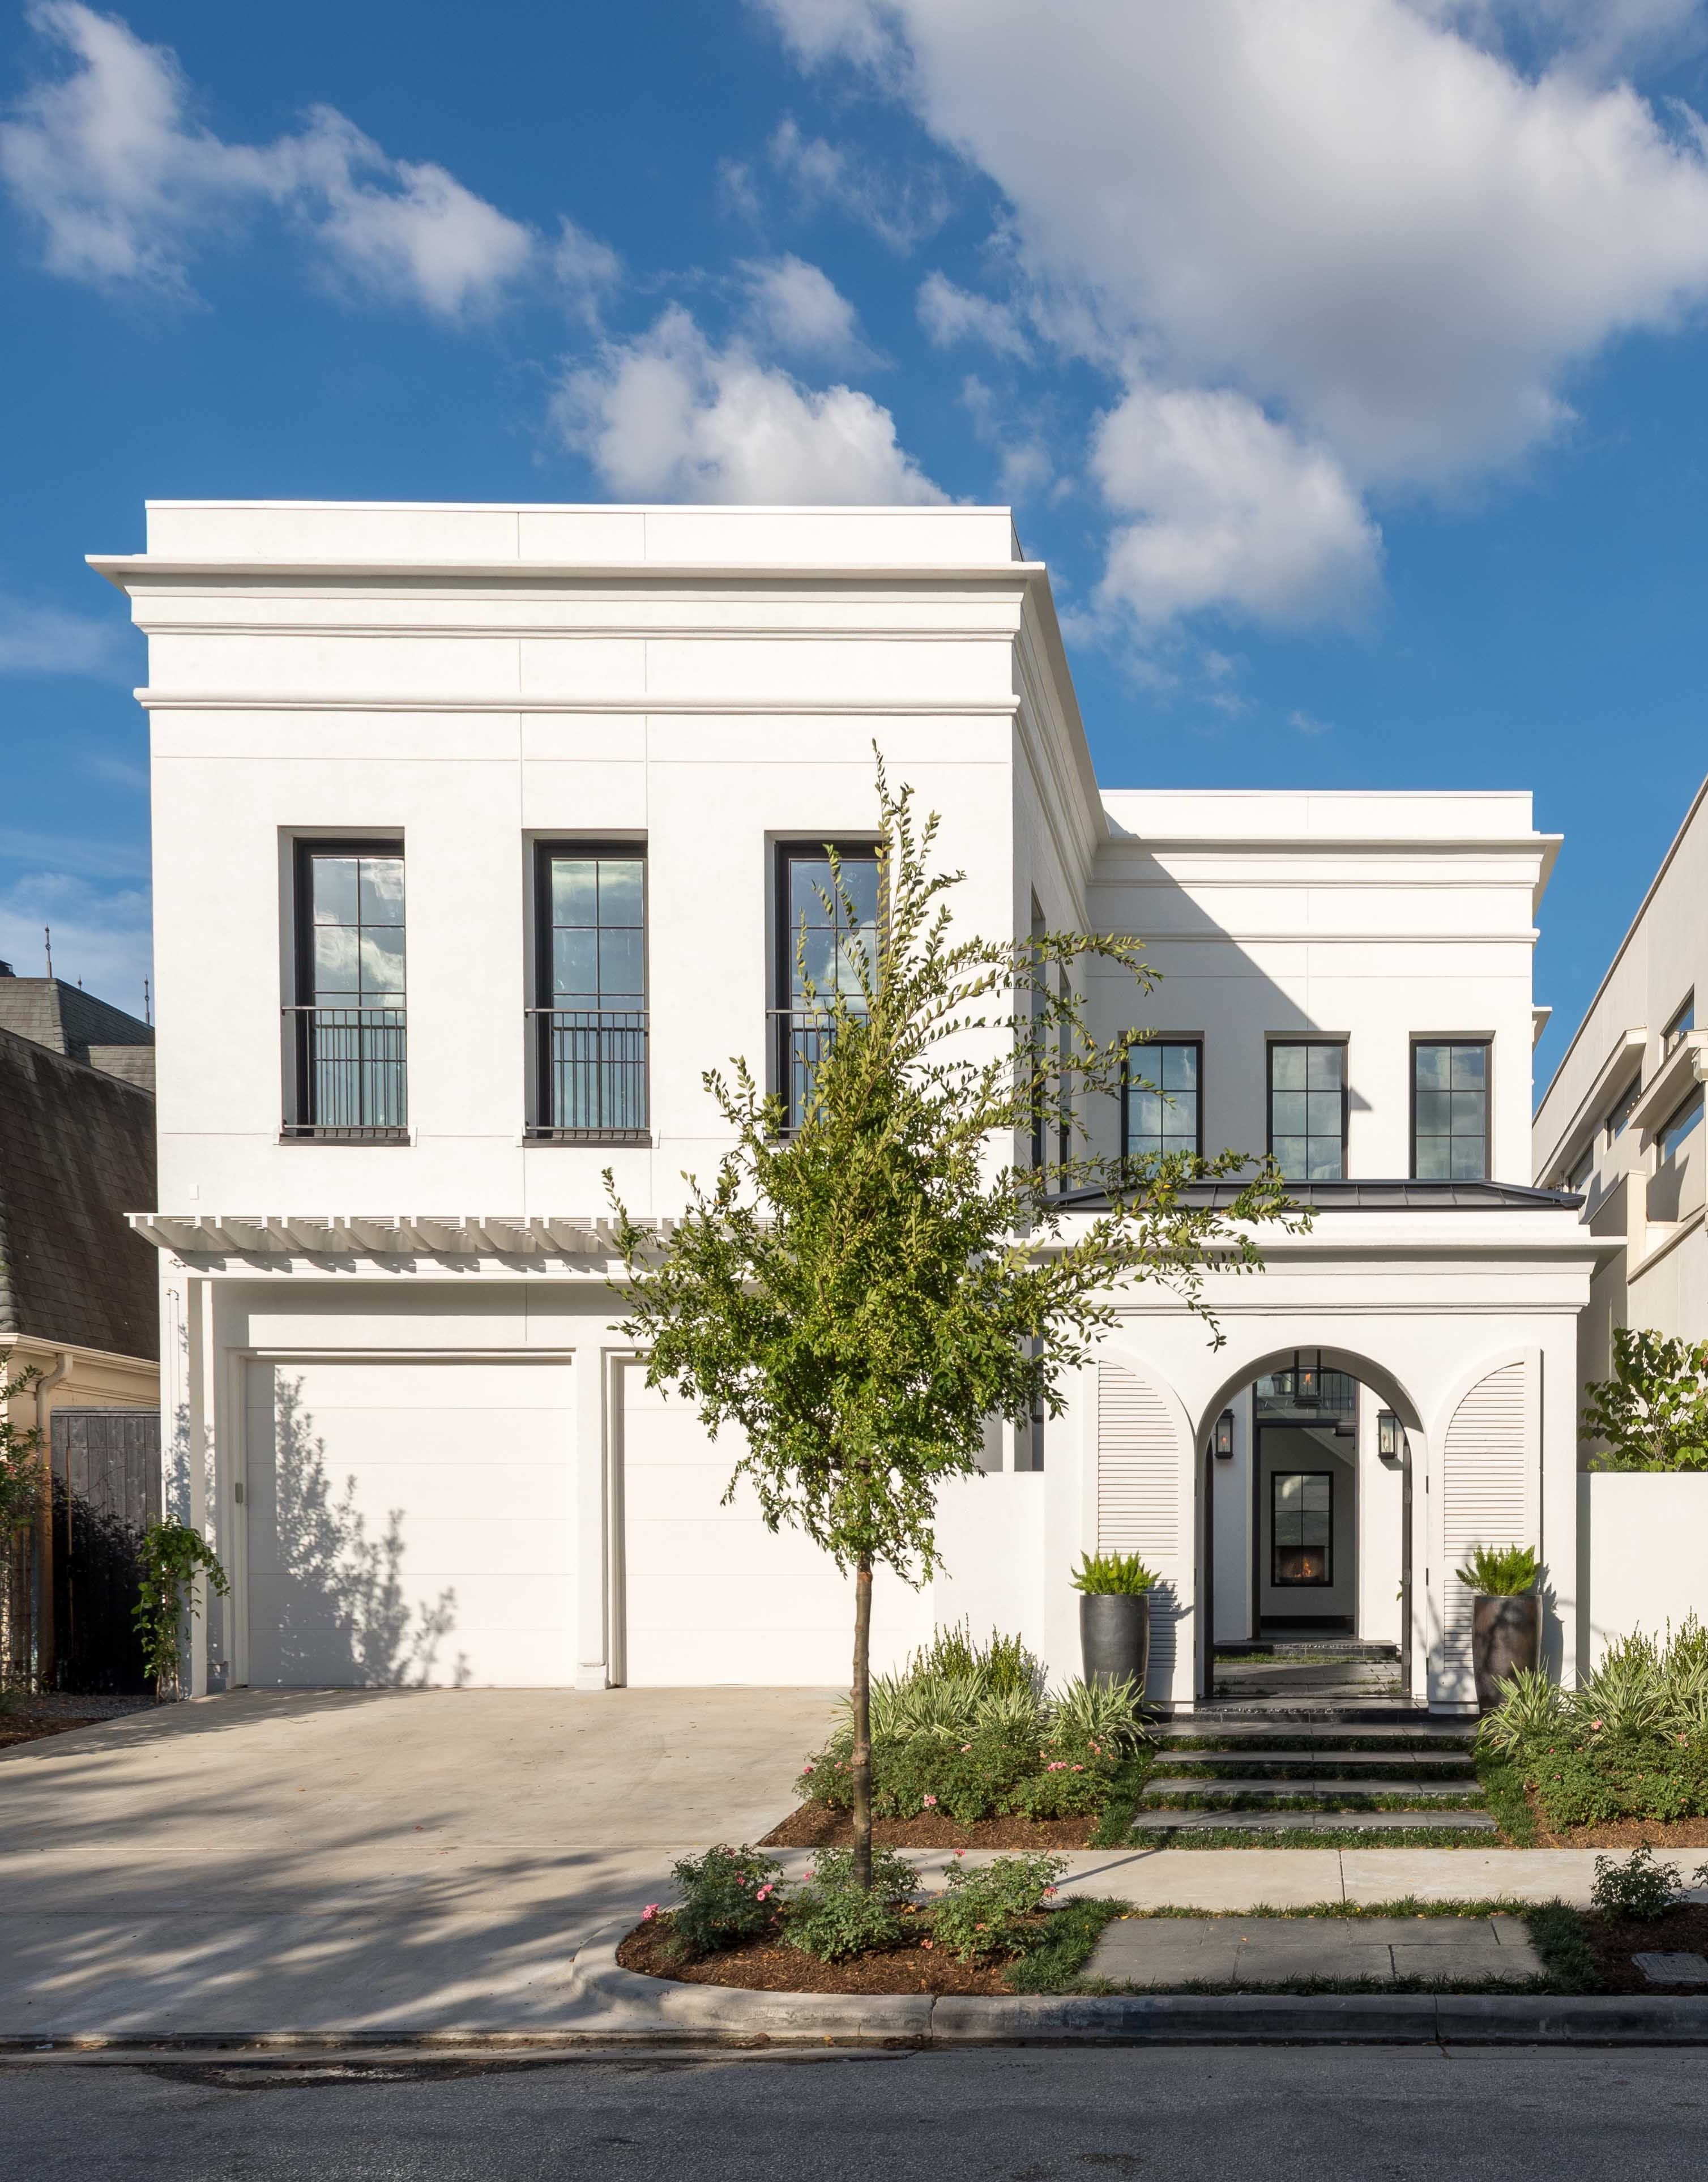 Exterior 30 Stunning Modern Landscape Design Ideas 30 Of Classic House Exterior Classic House Design Roman House